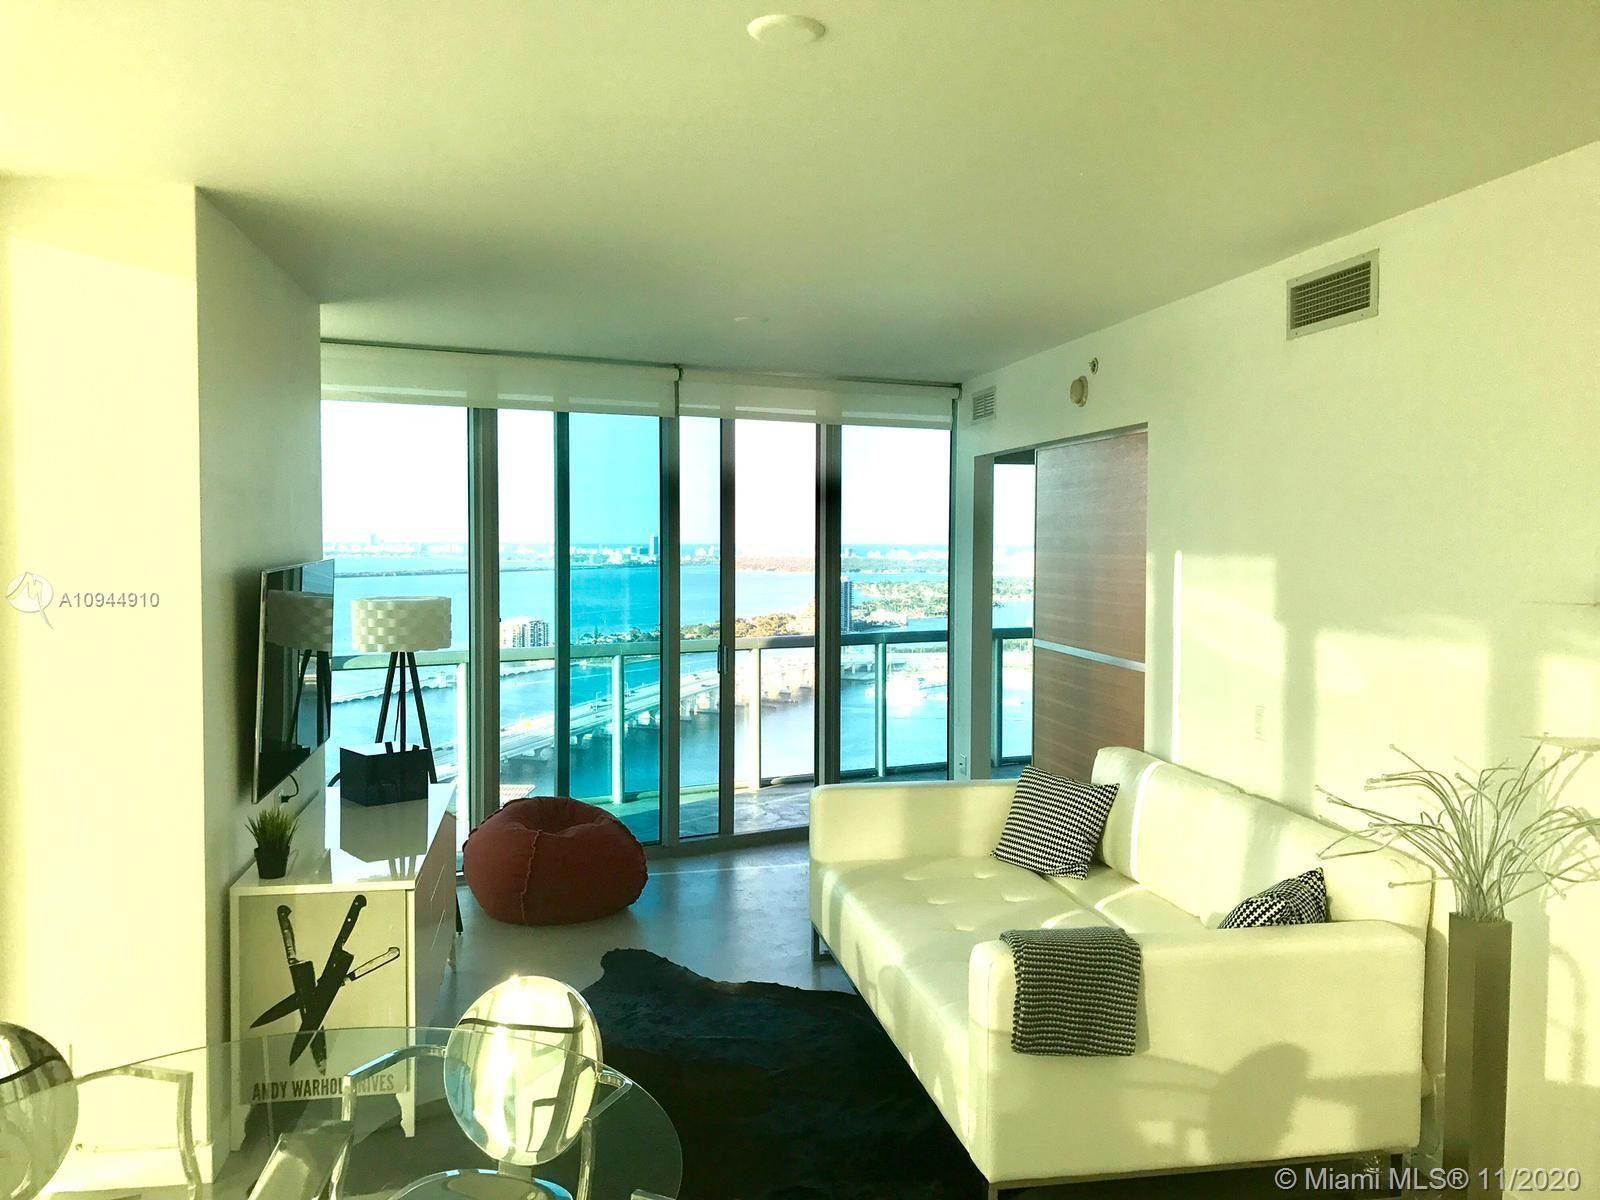 Photo of 888 Biscayne Blvd #4312, Miami, FL 33132 (MLS # A10944910)